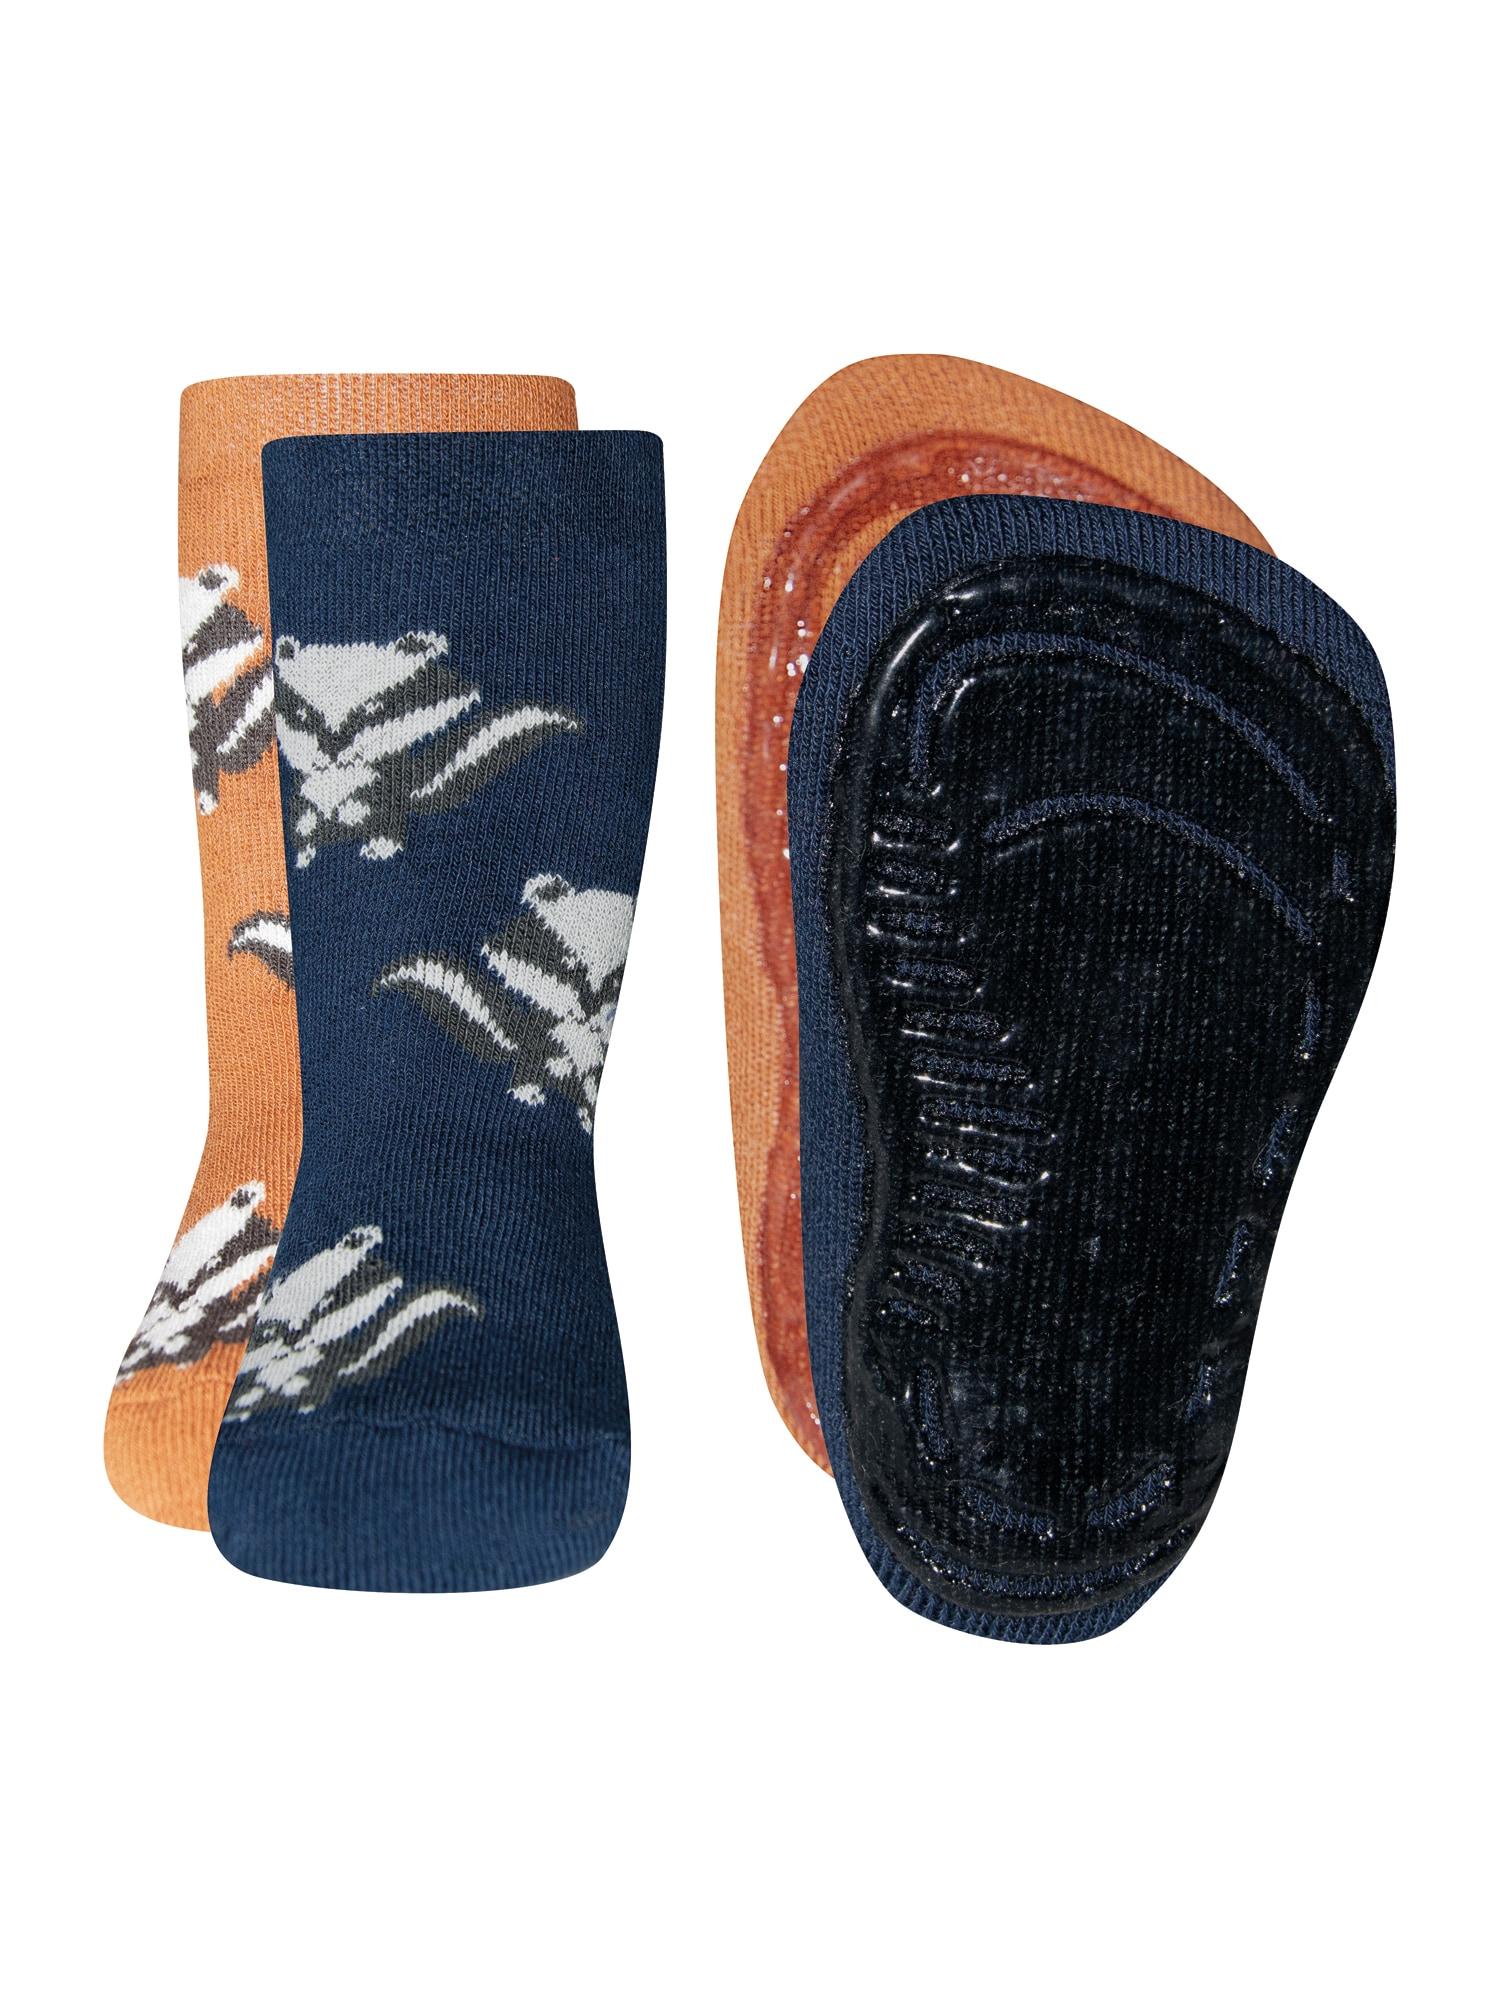 EWERS Ponožky  karamelová / modrá